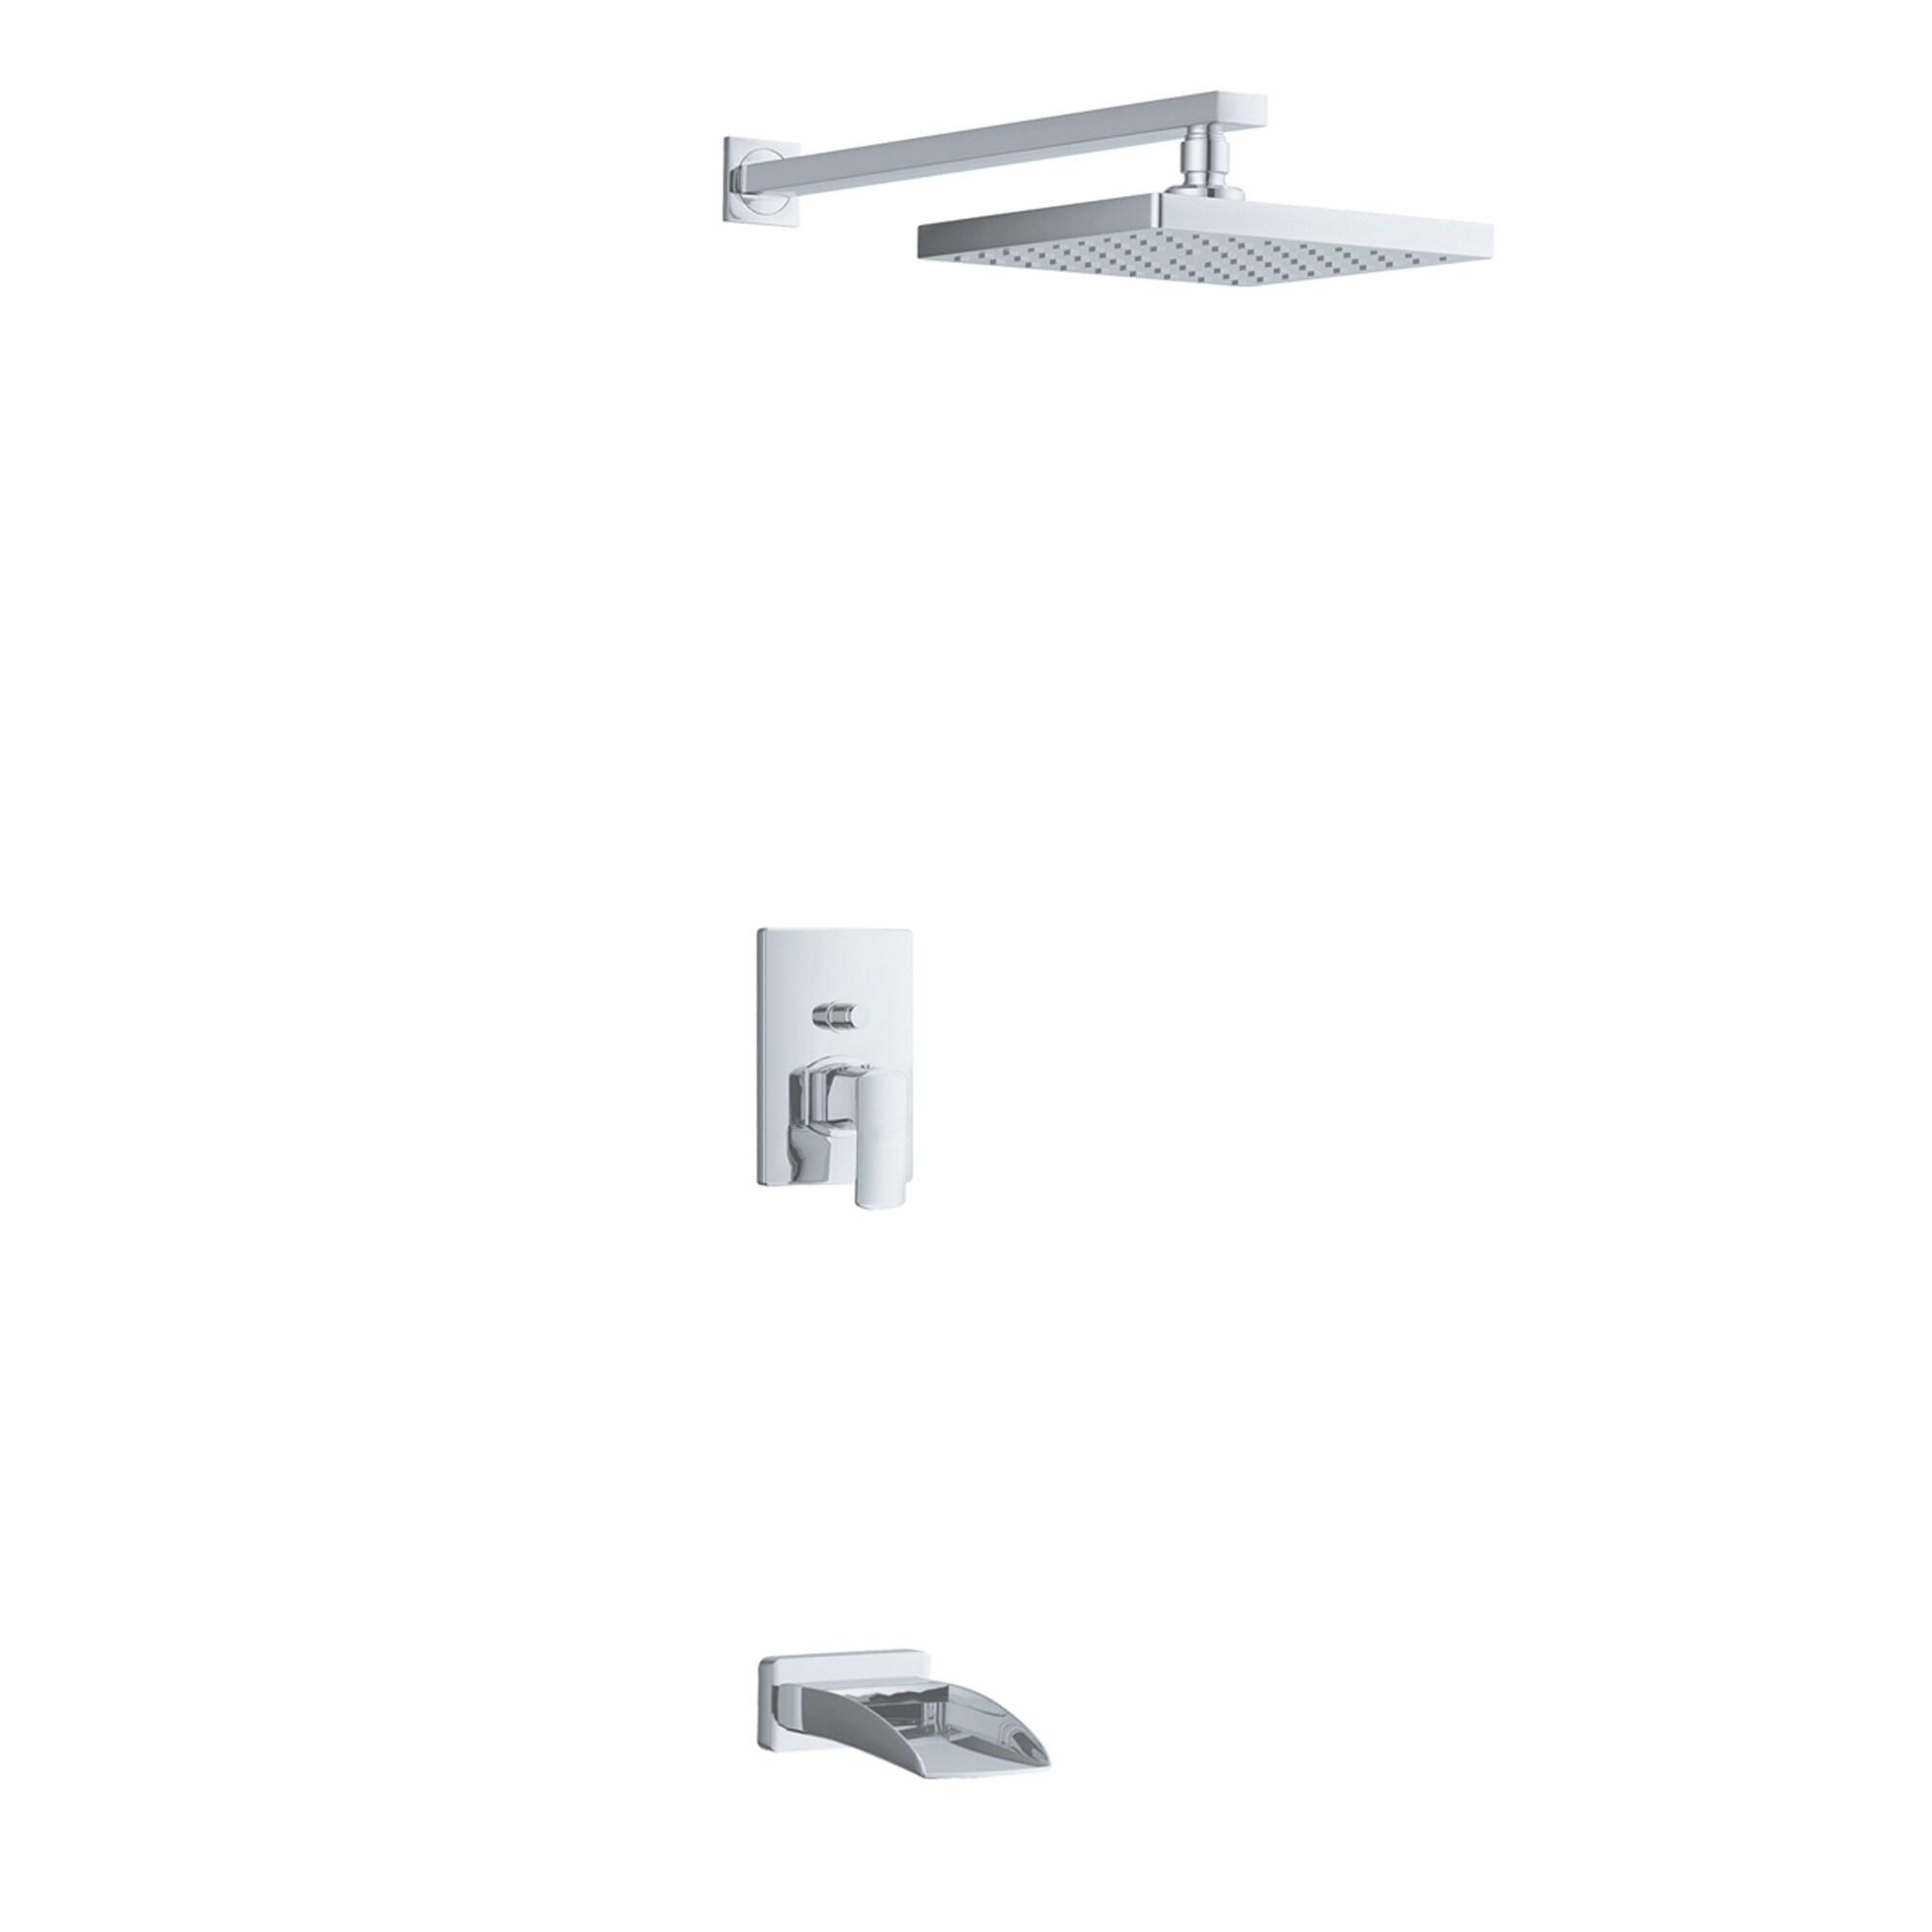 Sumerian Diverter Volume Control Shower Faucet With Valve